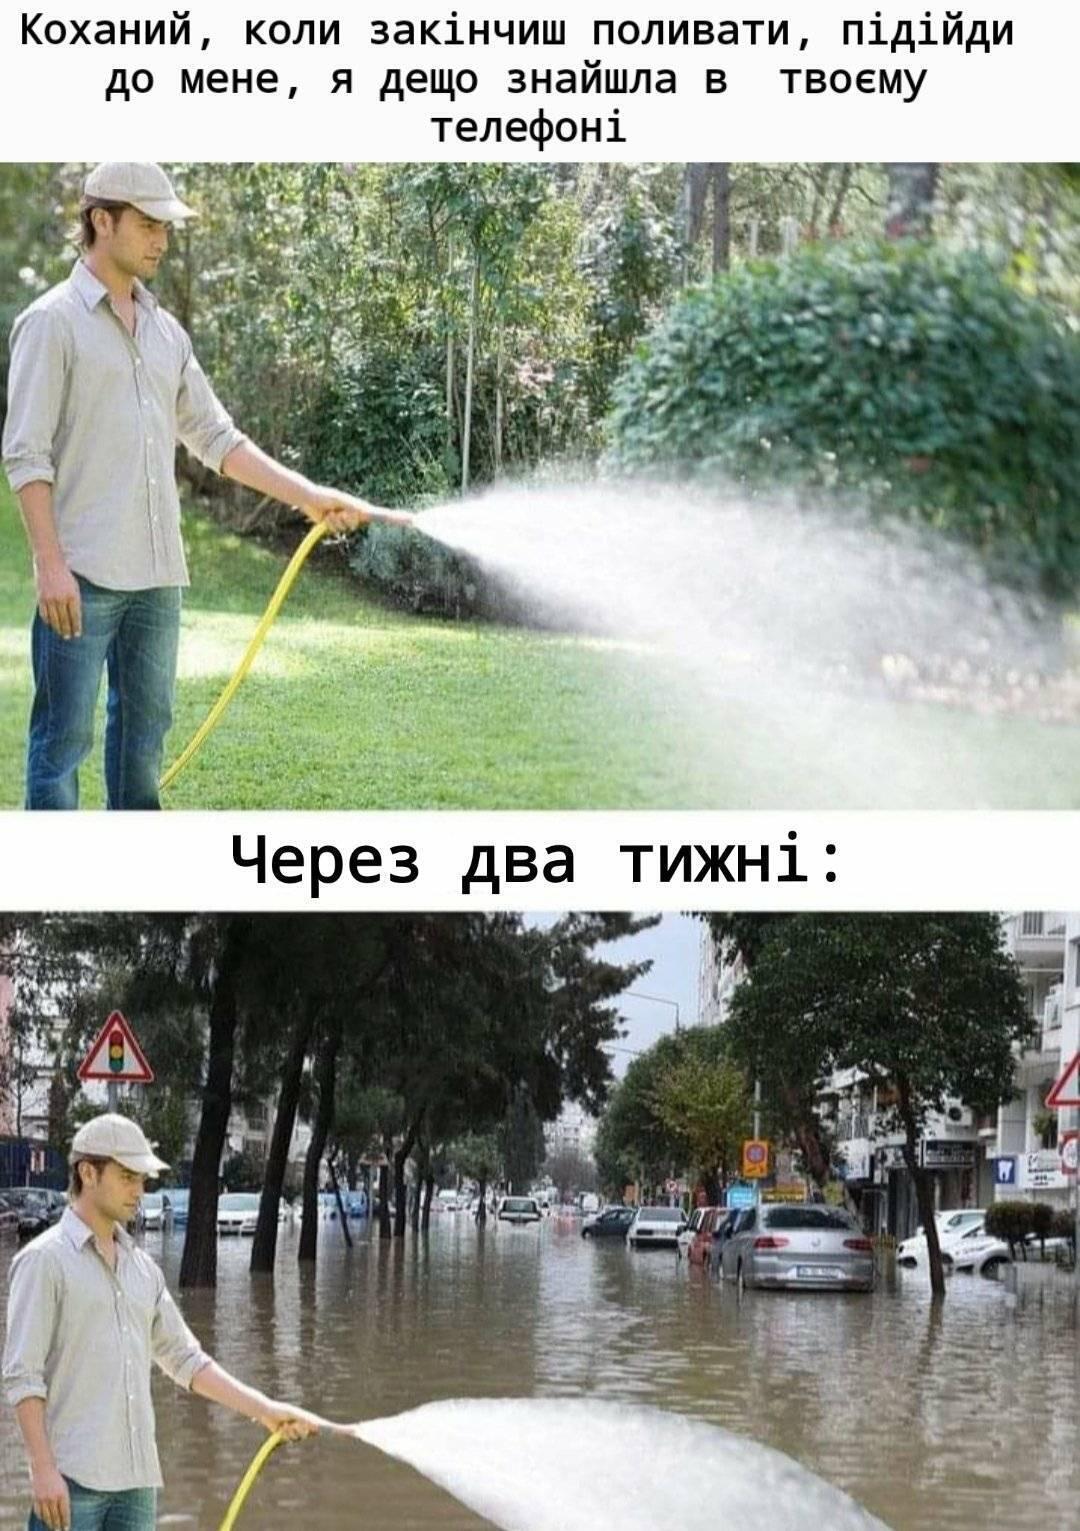 Мем про стосунки